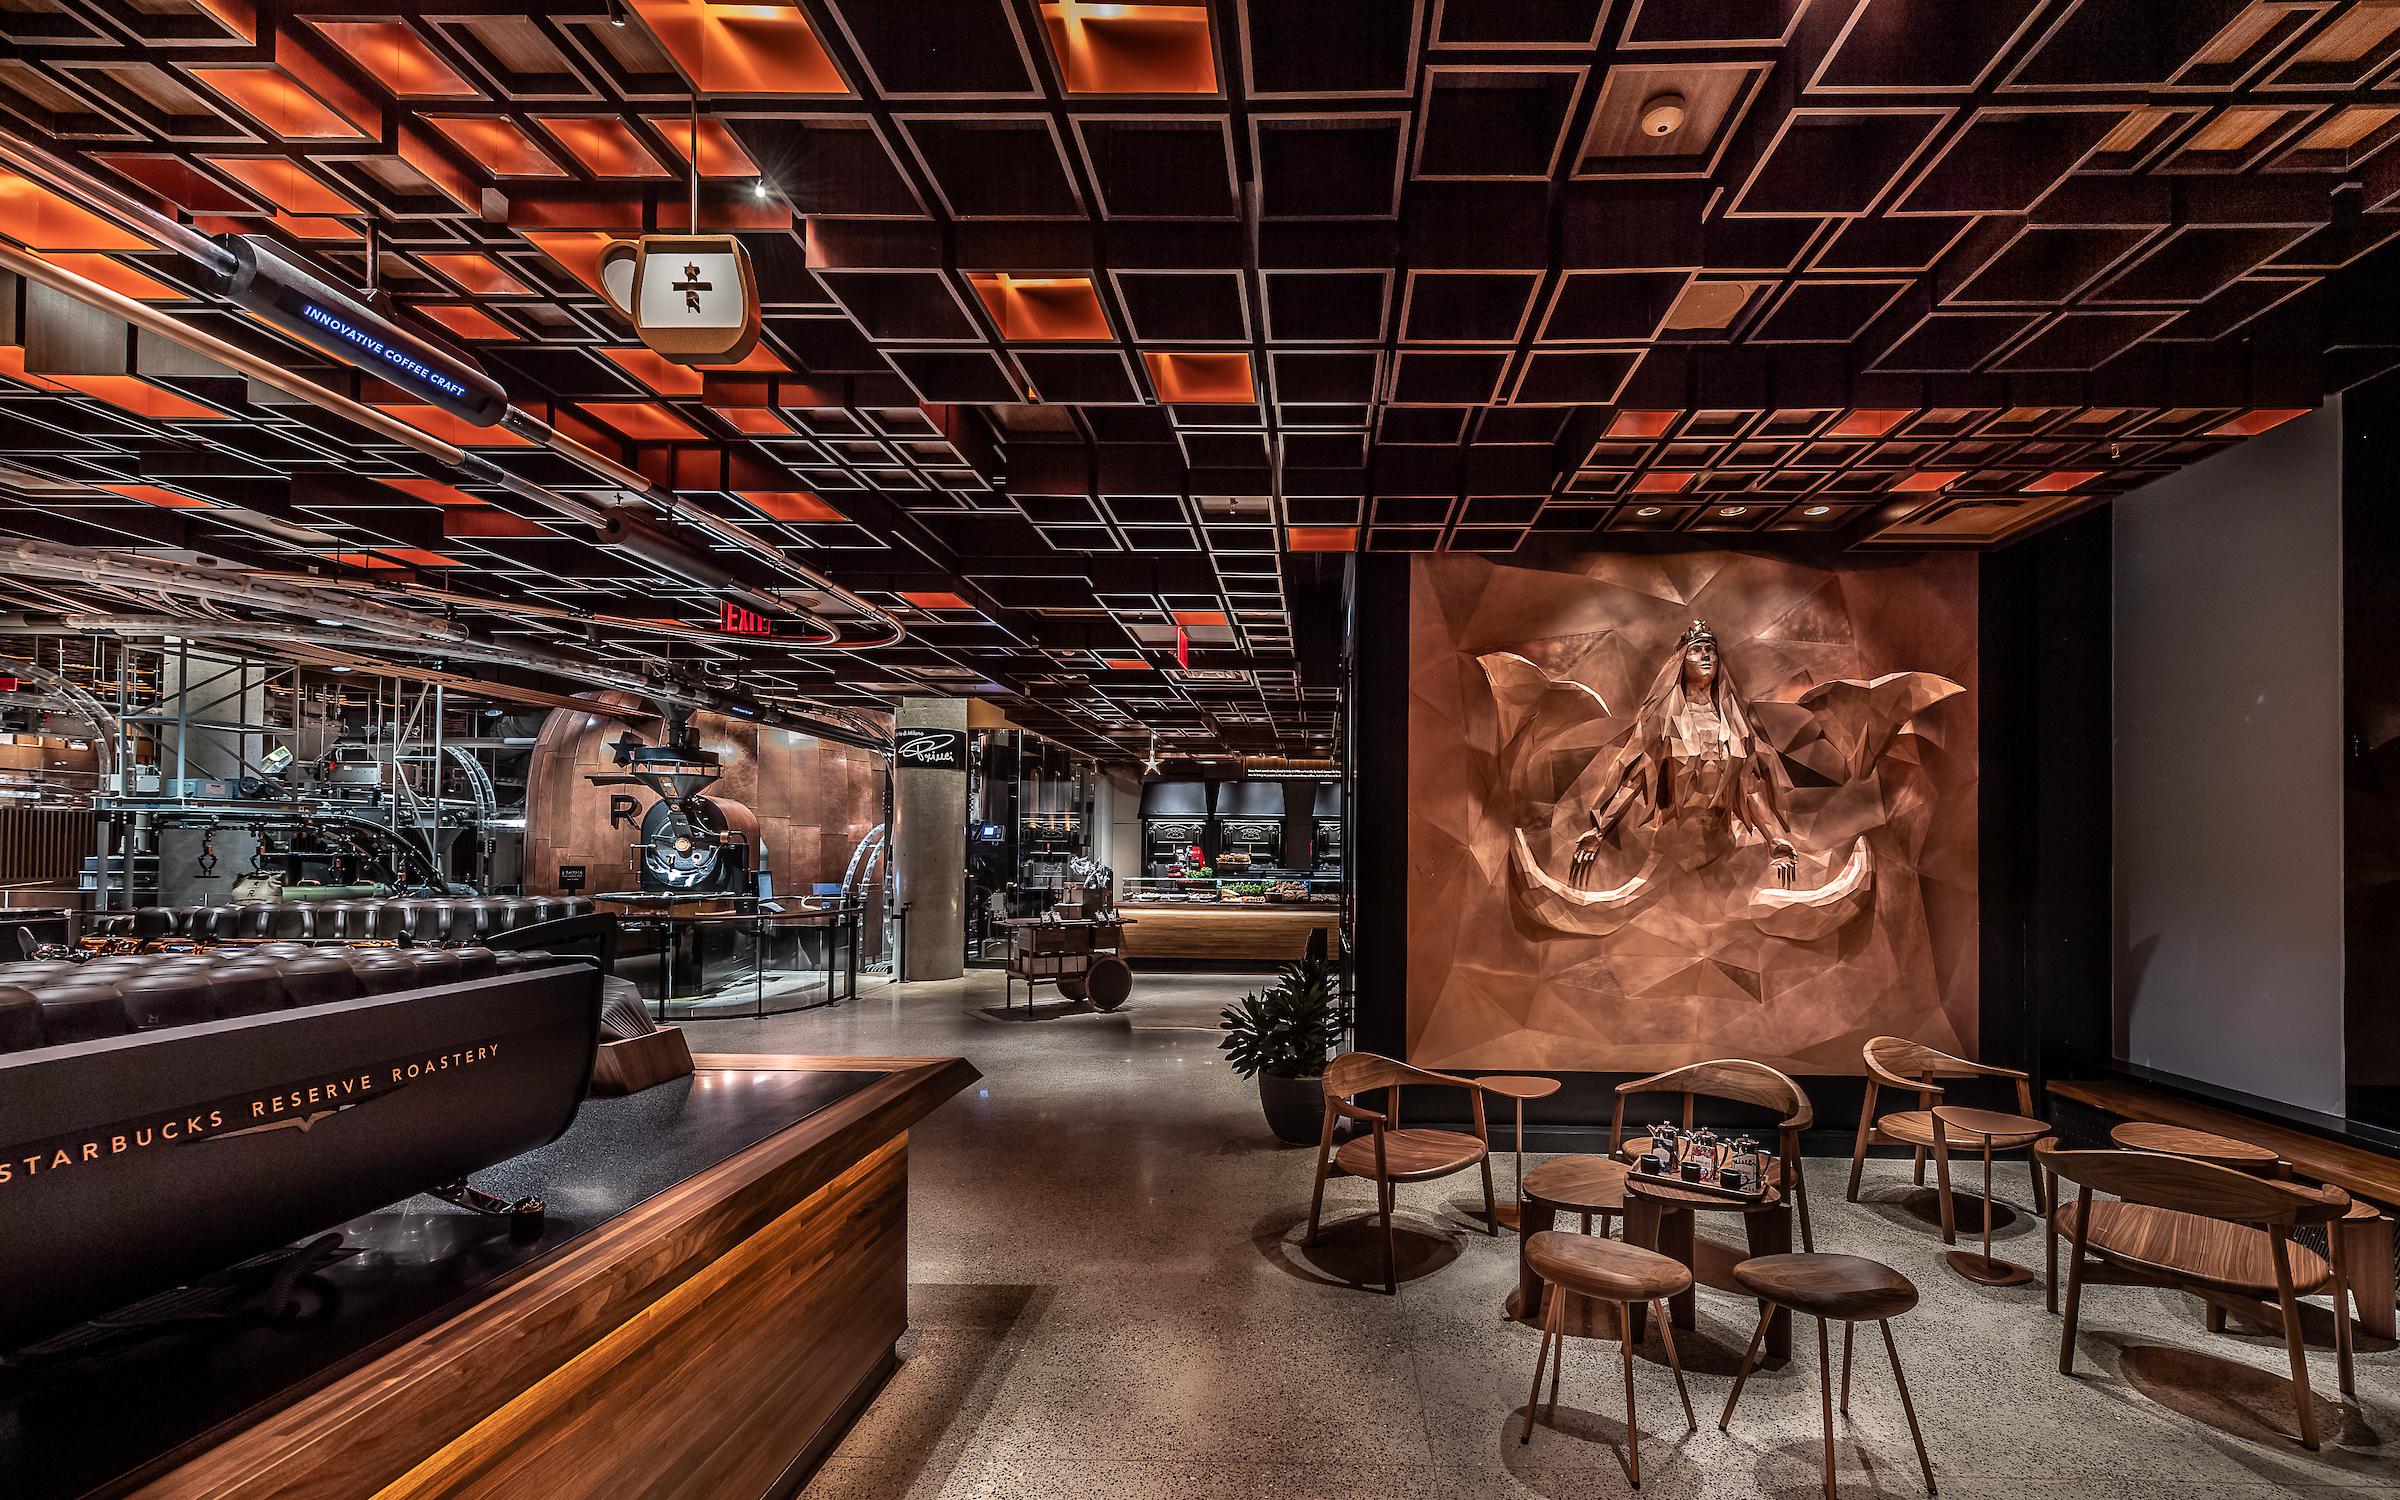 Starbucks New York Roastery